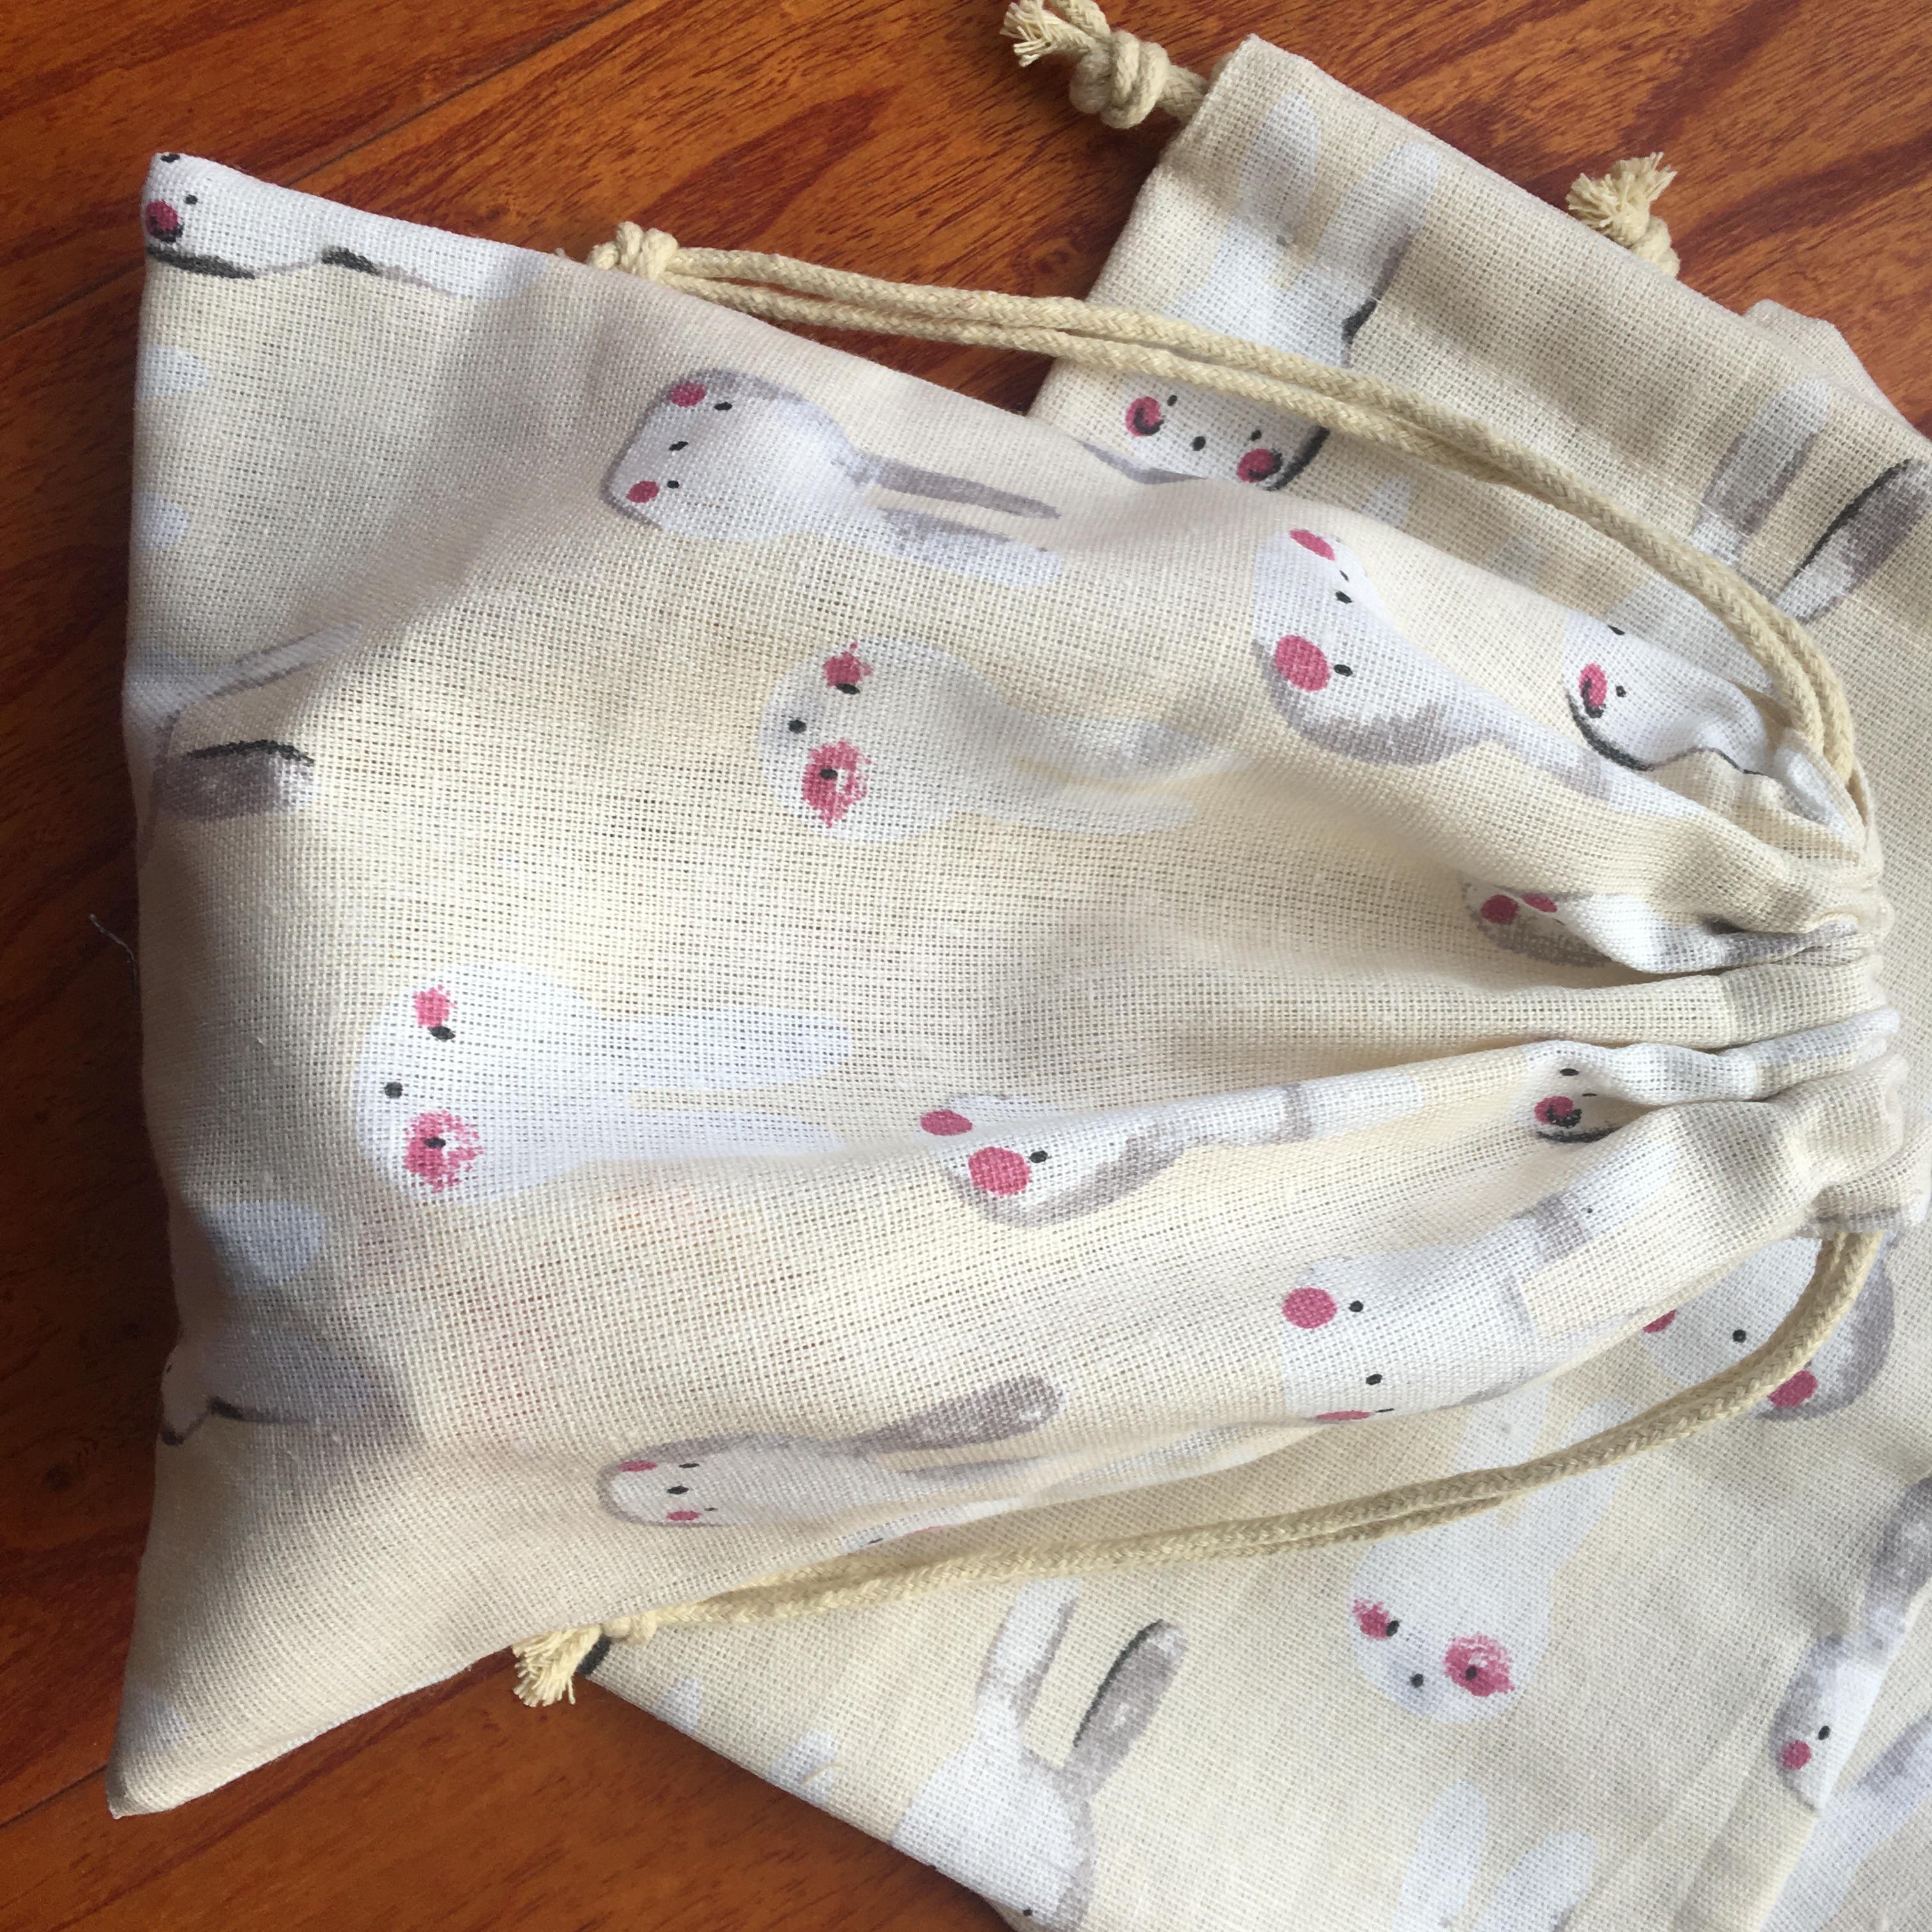 Cotton Linen Drawstring Pouch Multi-purpose Bag Party Gift Bag Print Bunny YILE91105a